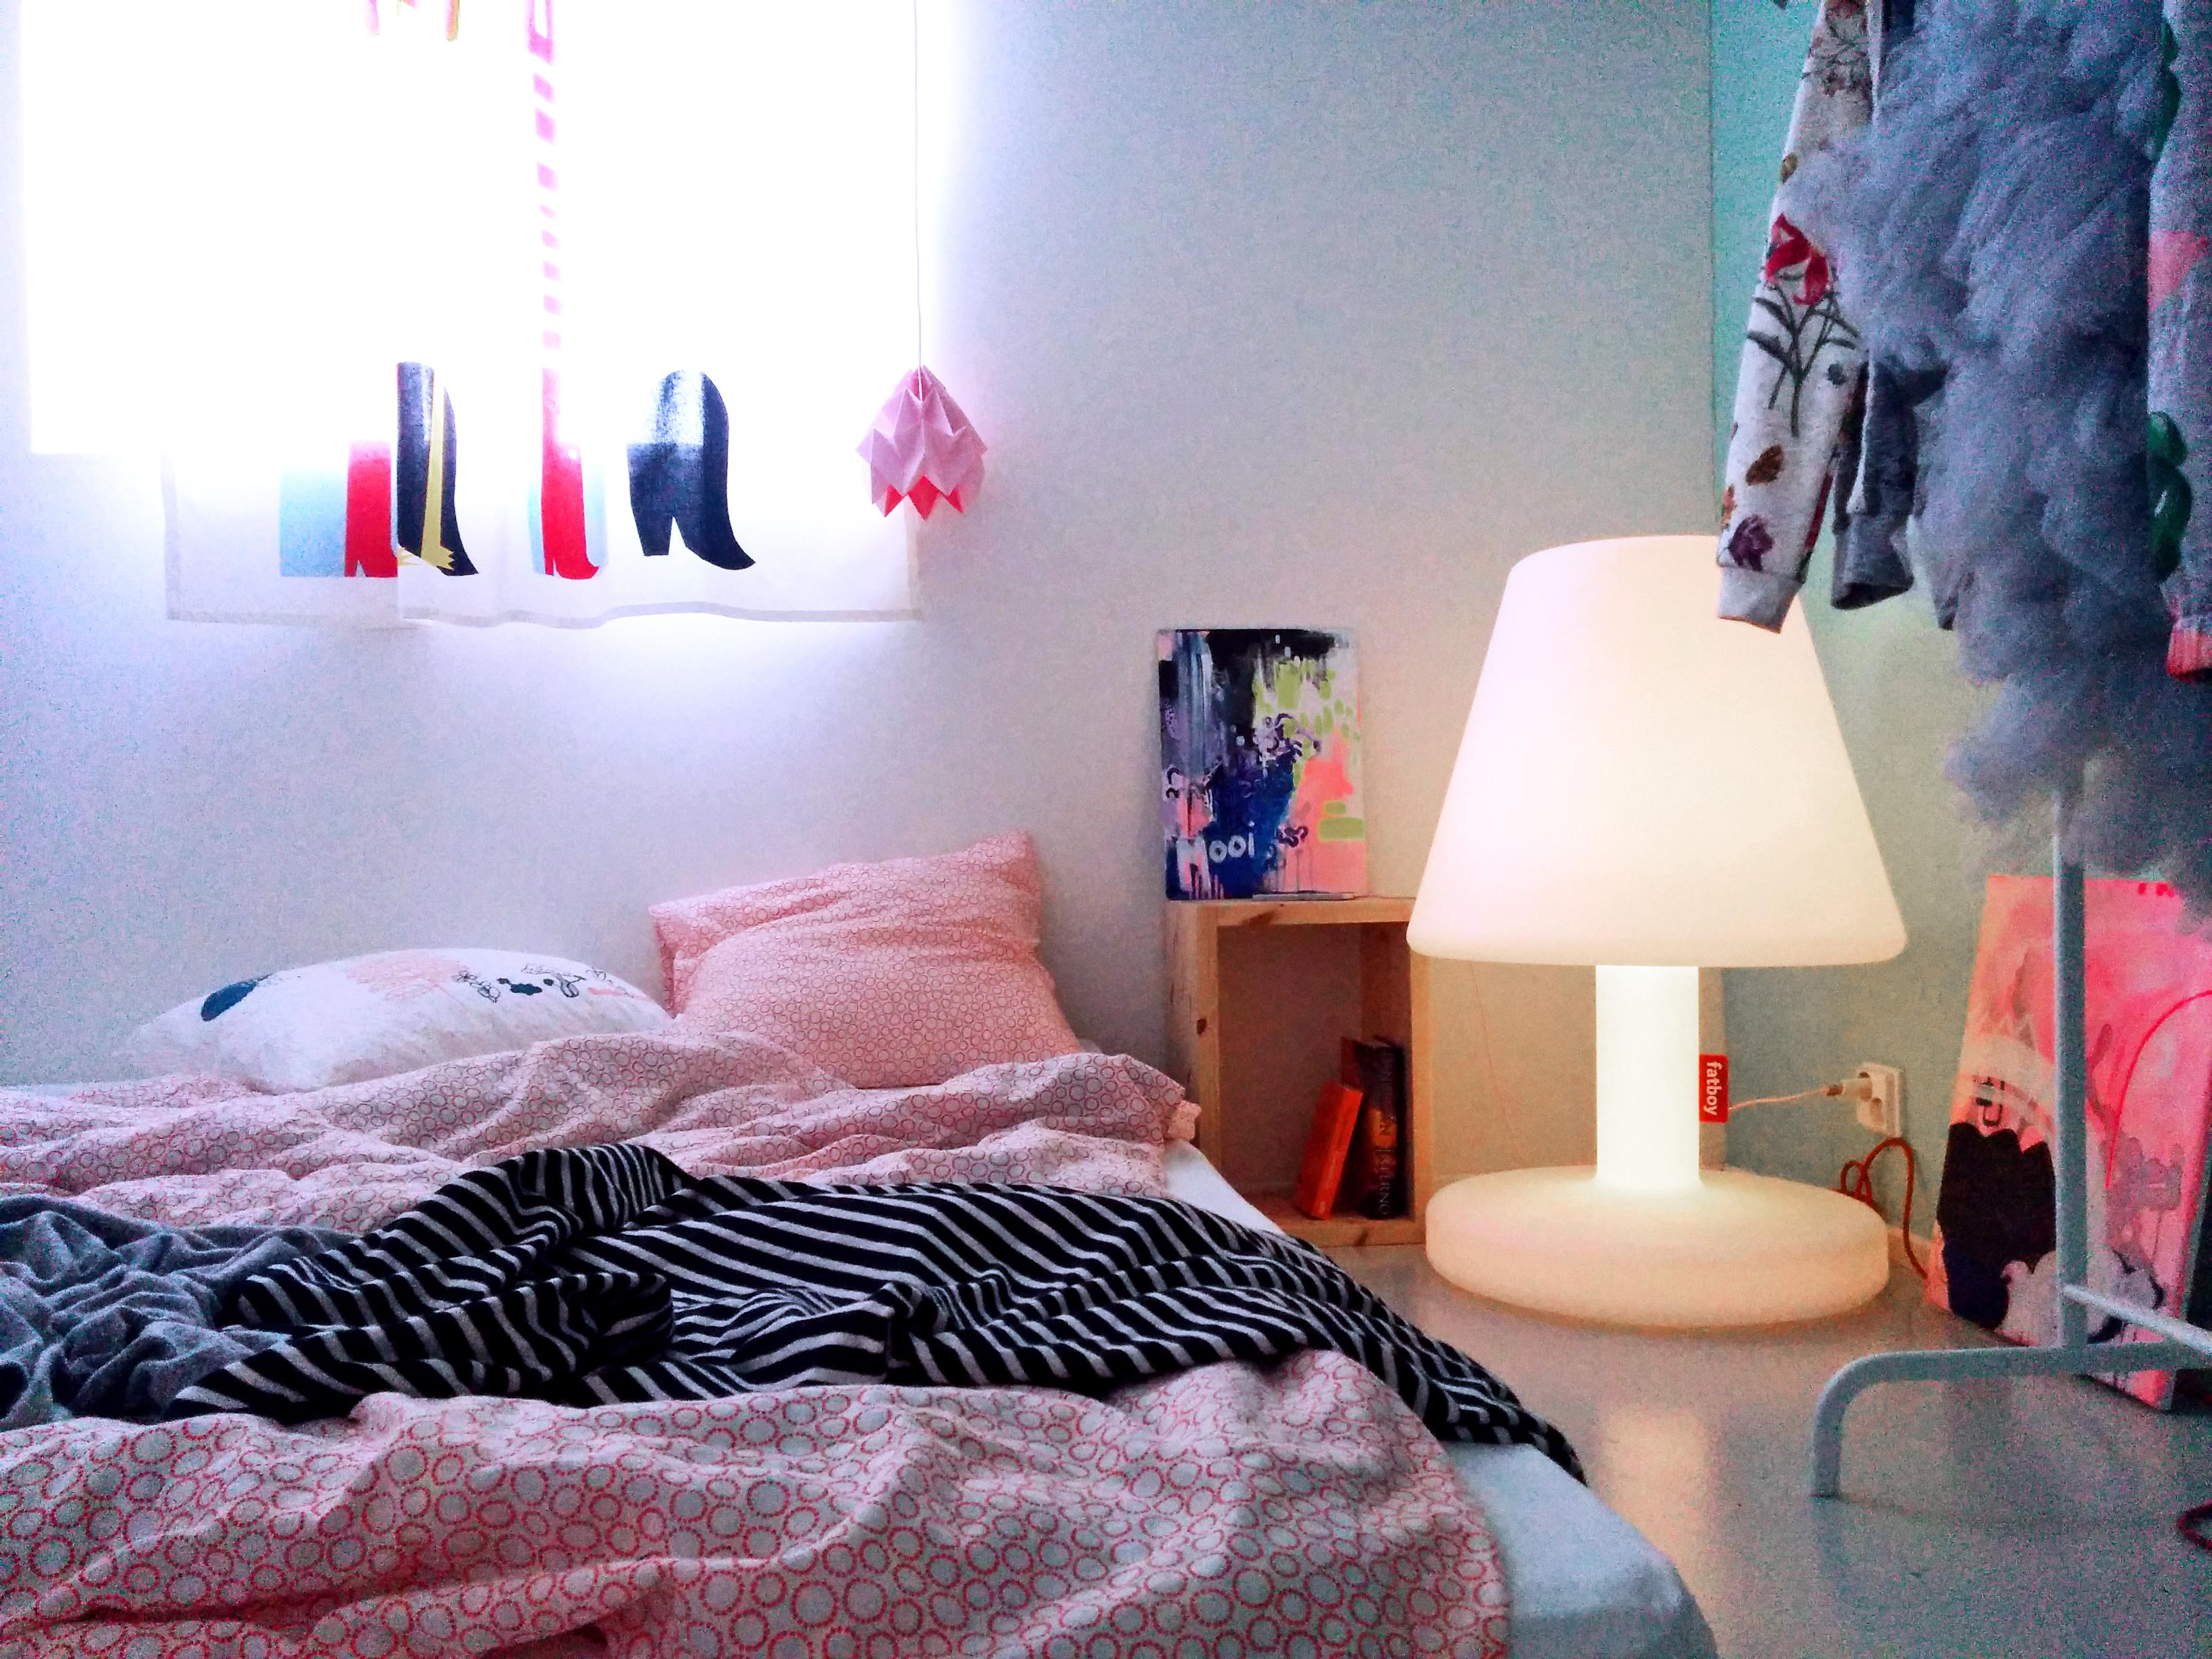 fatboy lamppu, värikäs makuuhuone.jpg